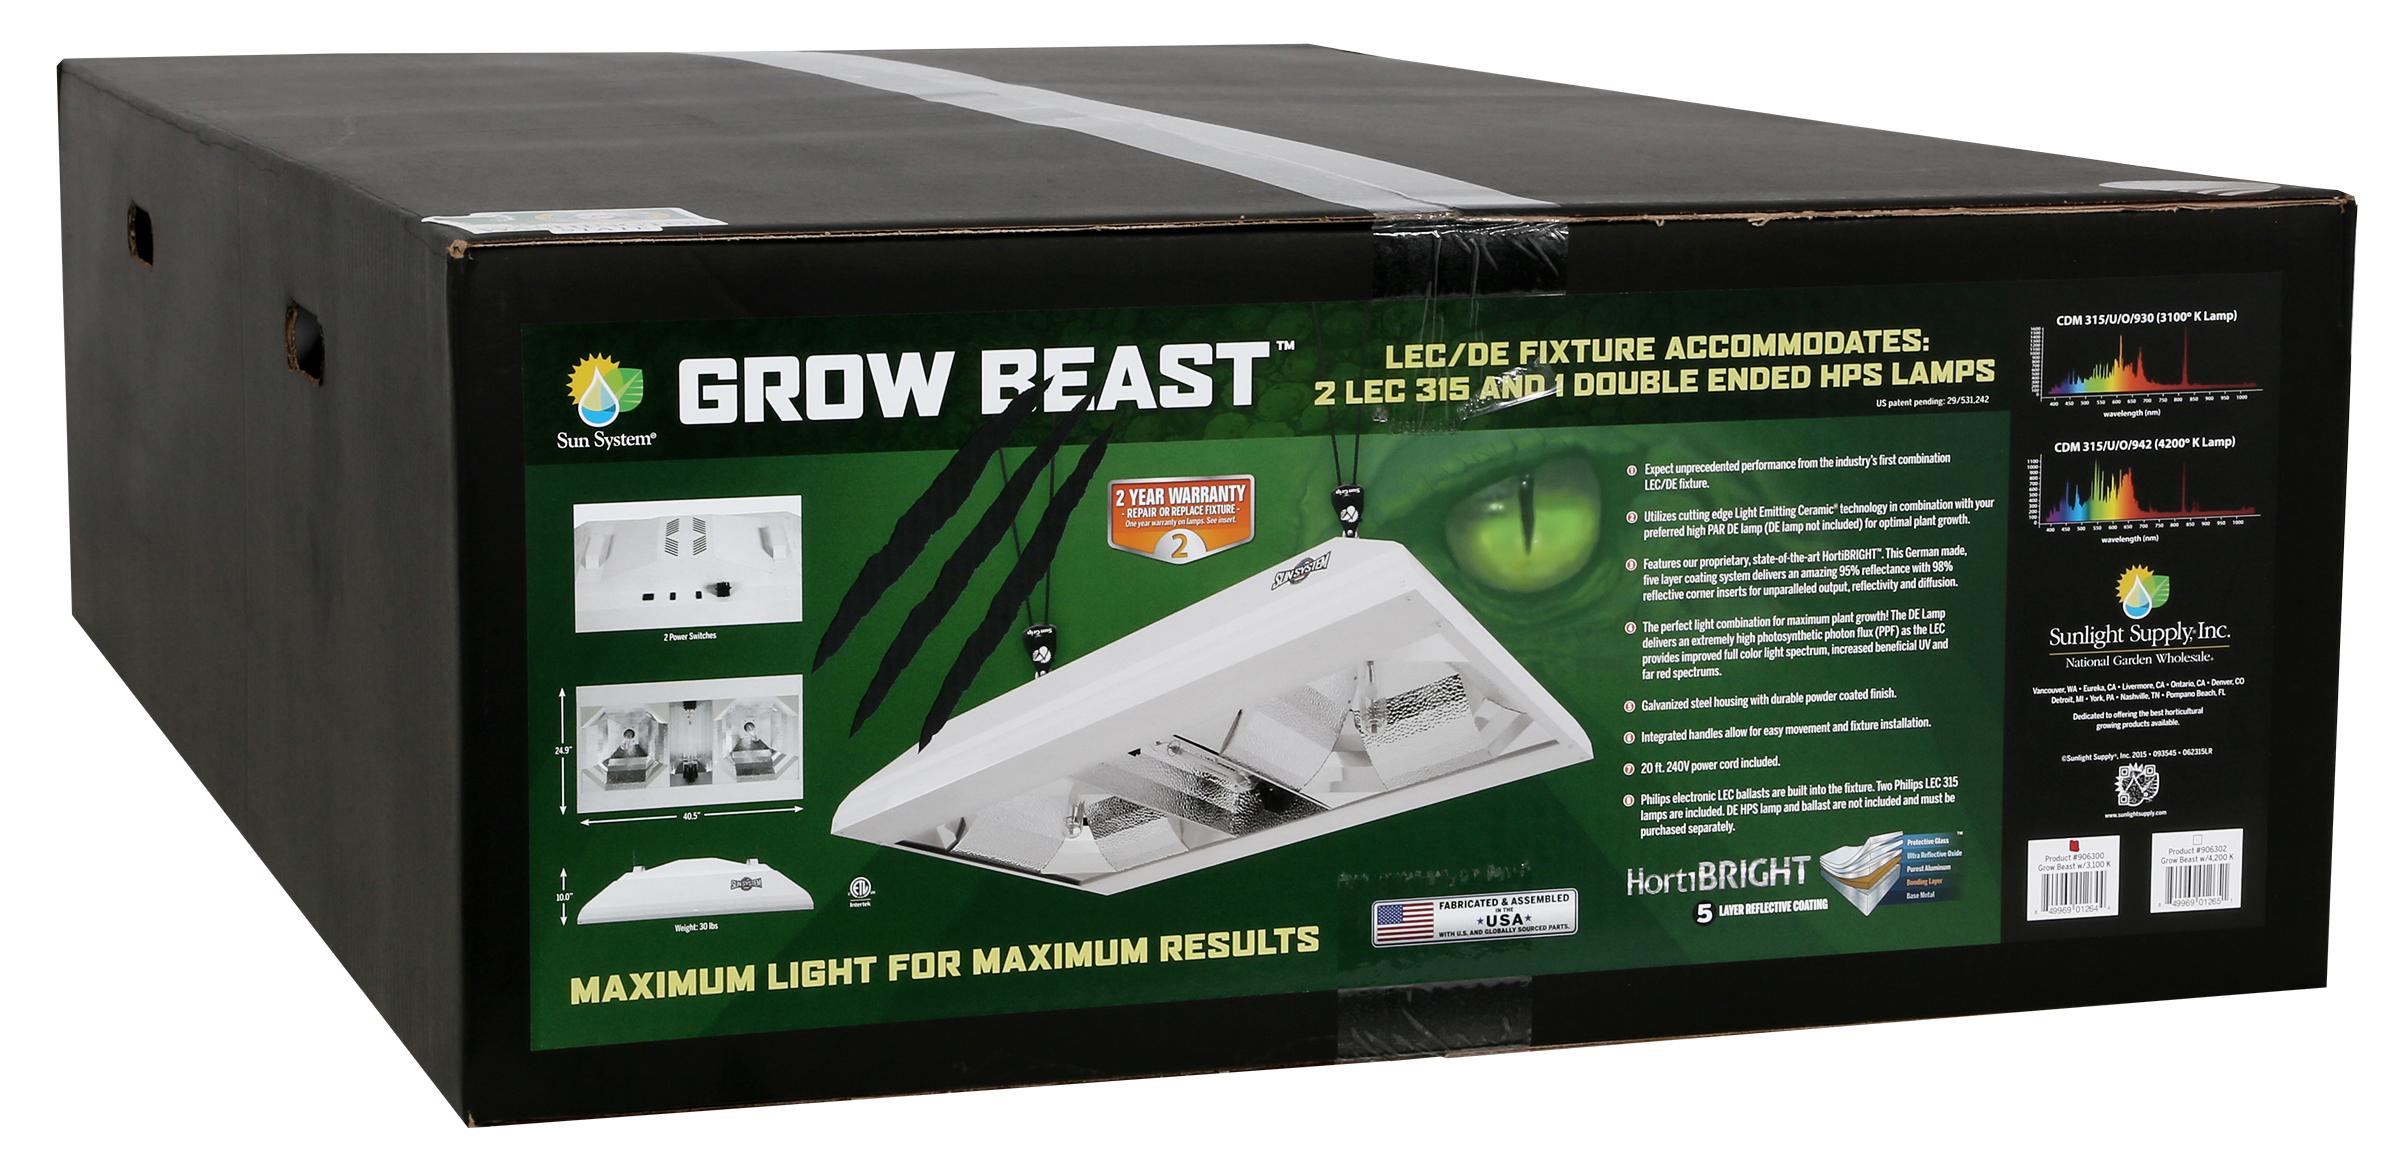 Save $300 on the Grow Beast